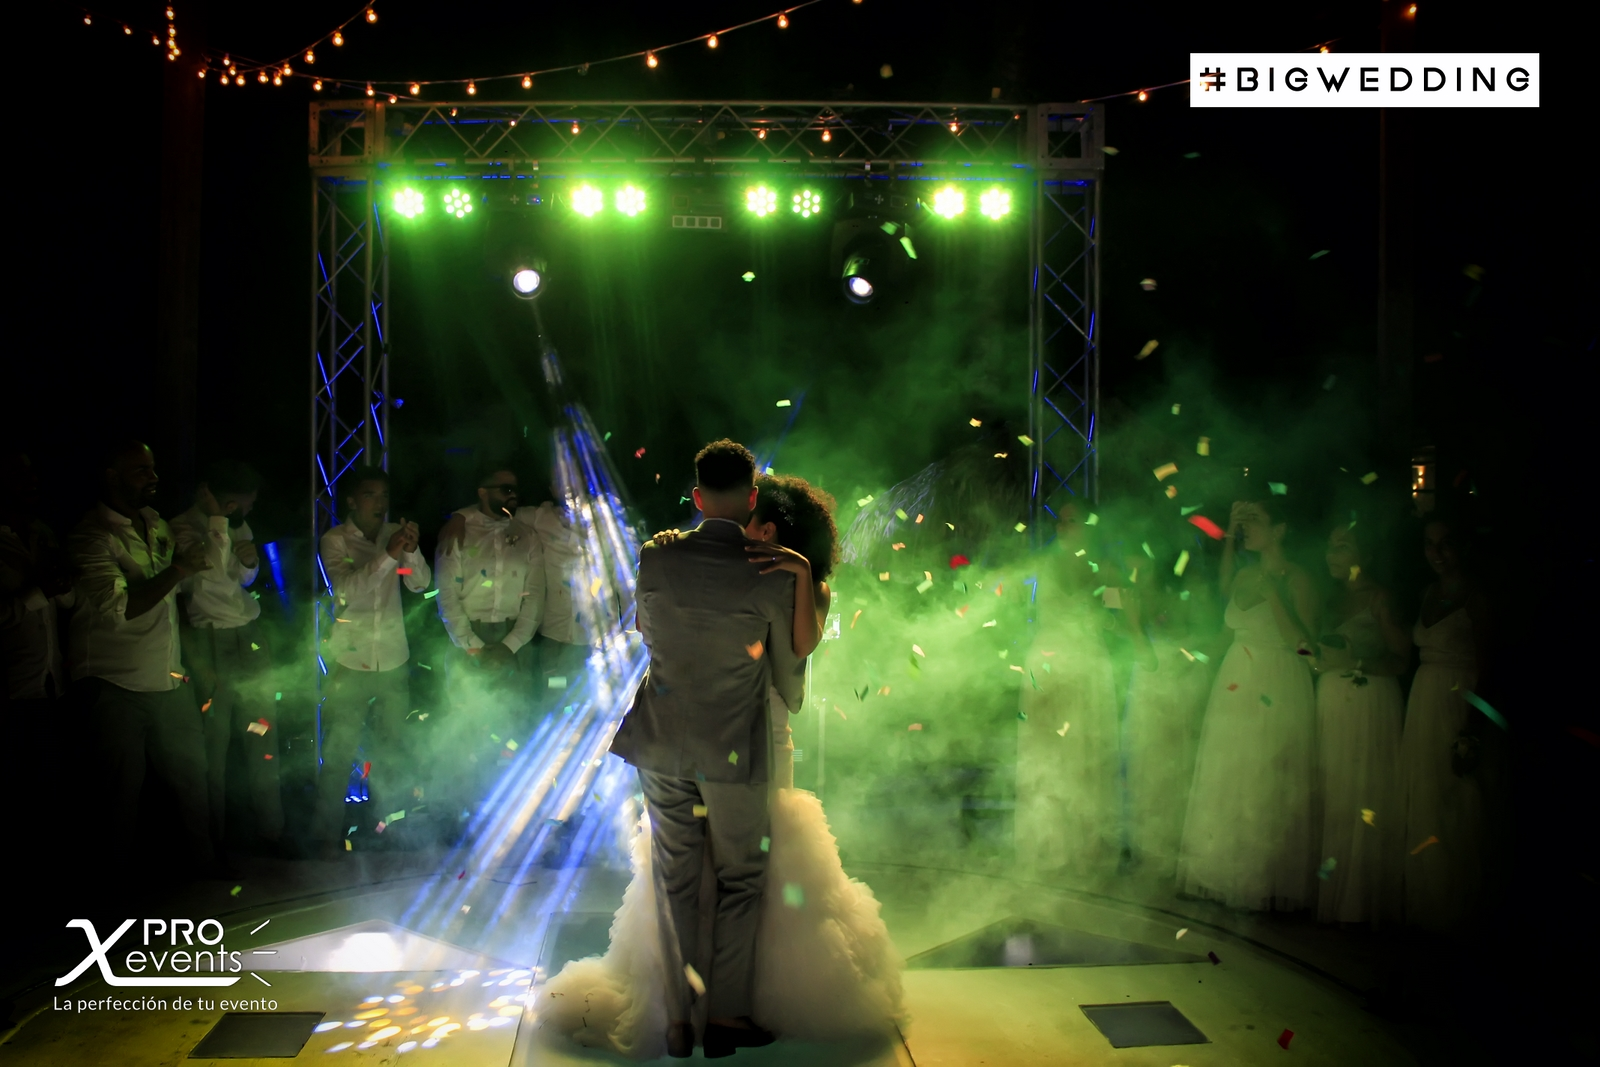 X Pro Events - Montaje para boda - 2018-